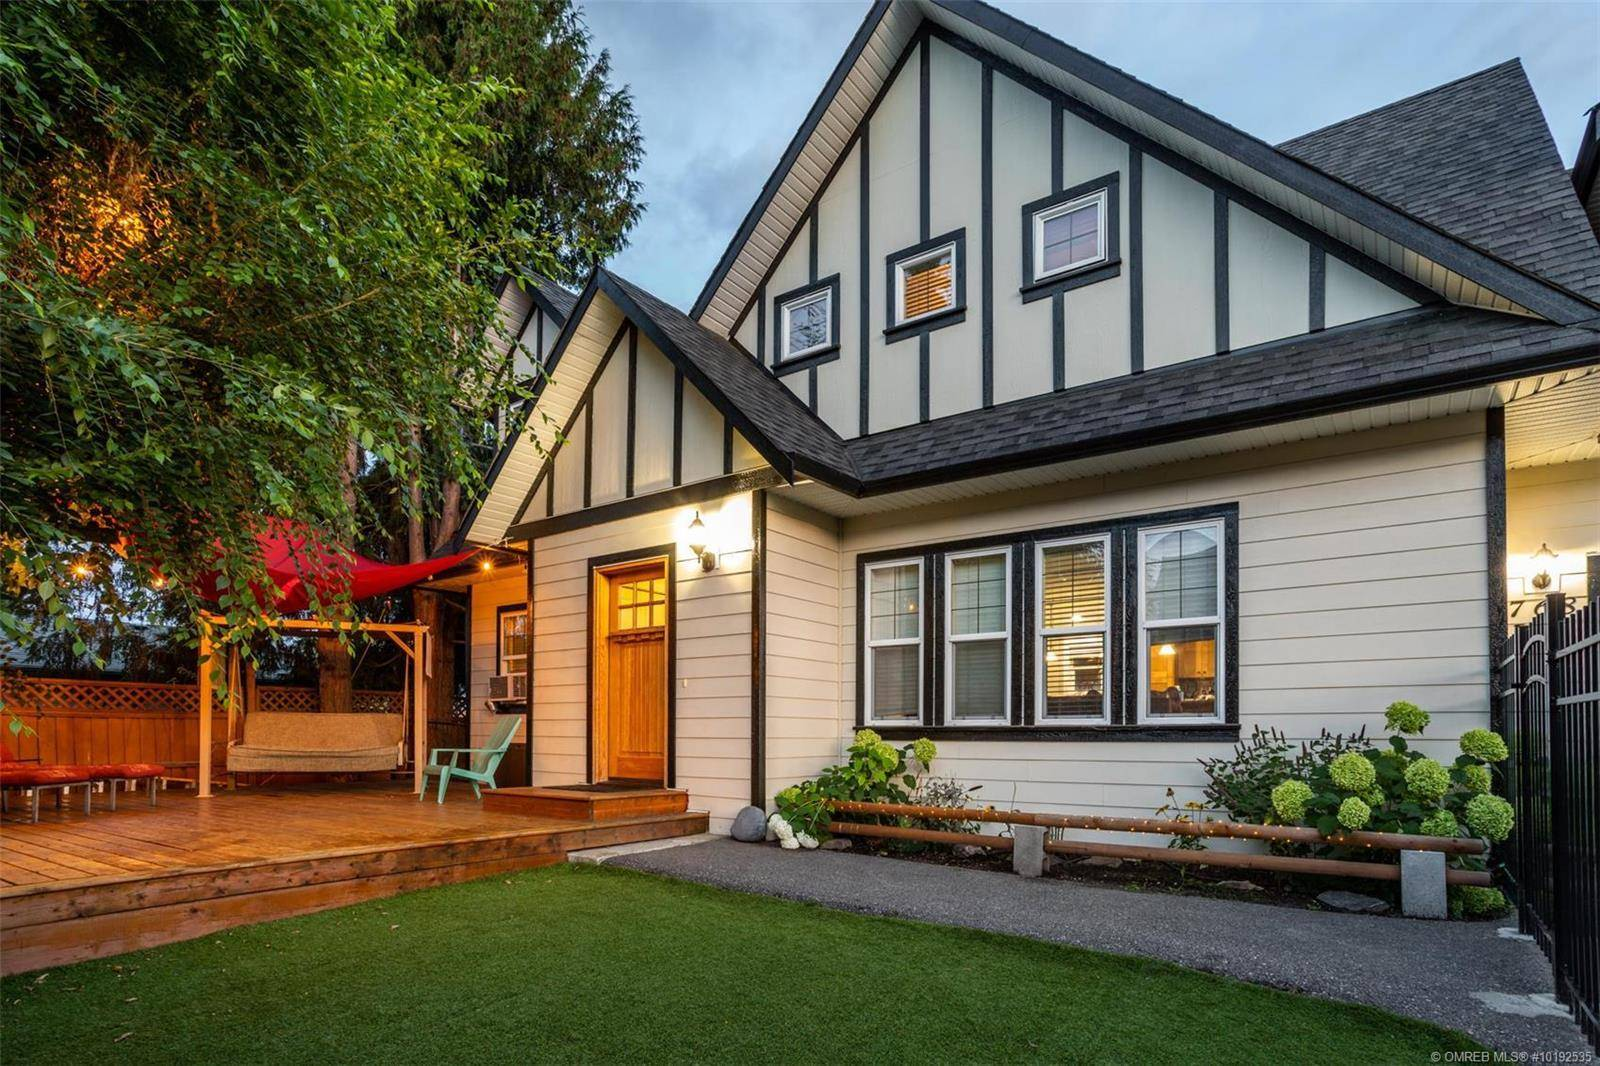 House for sale at 768 Wardlaw Ave Kelowna British Columbia - MLS: 10192535